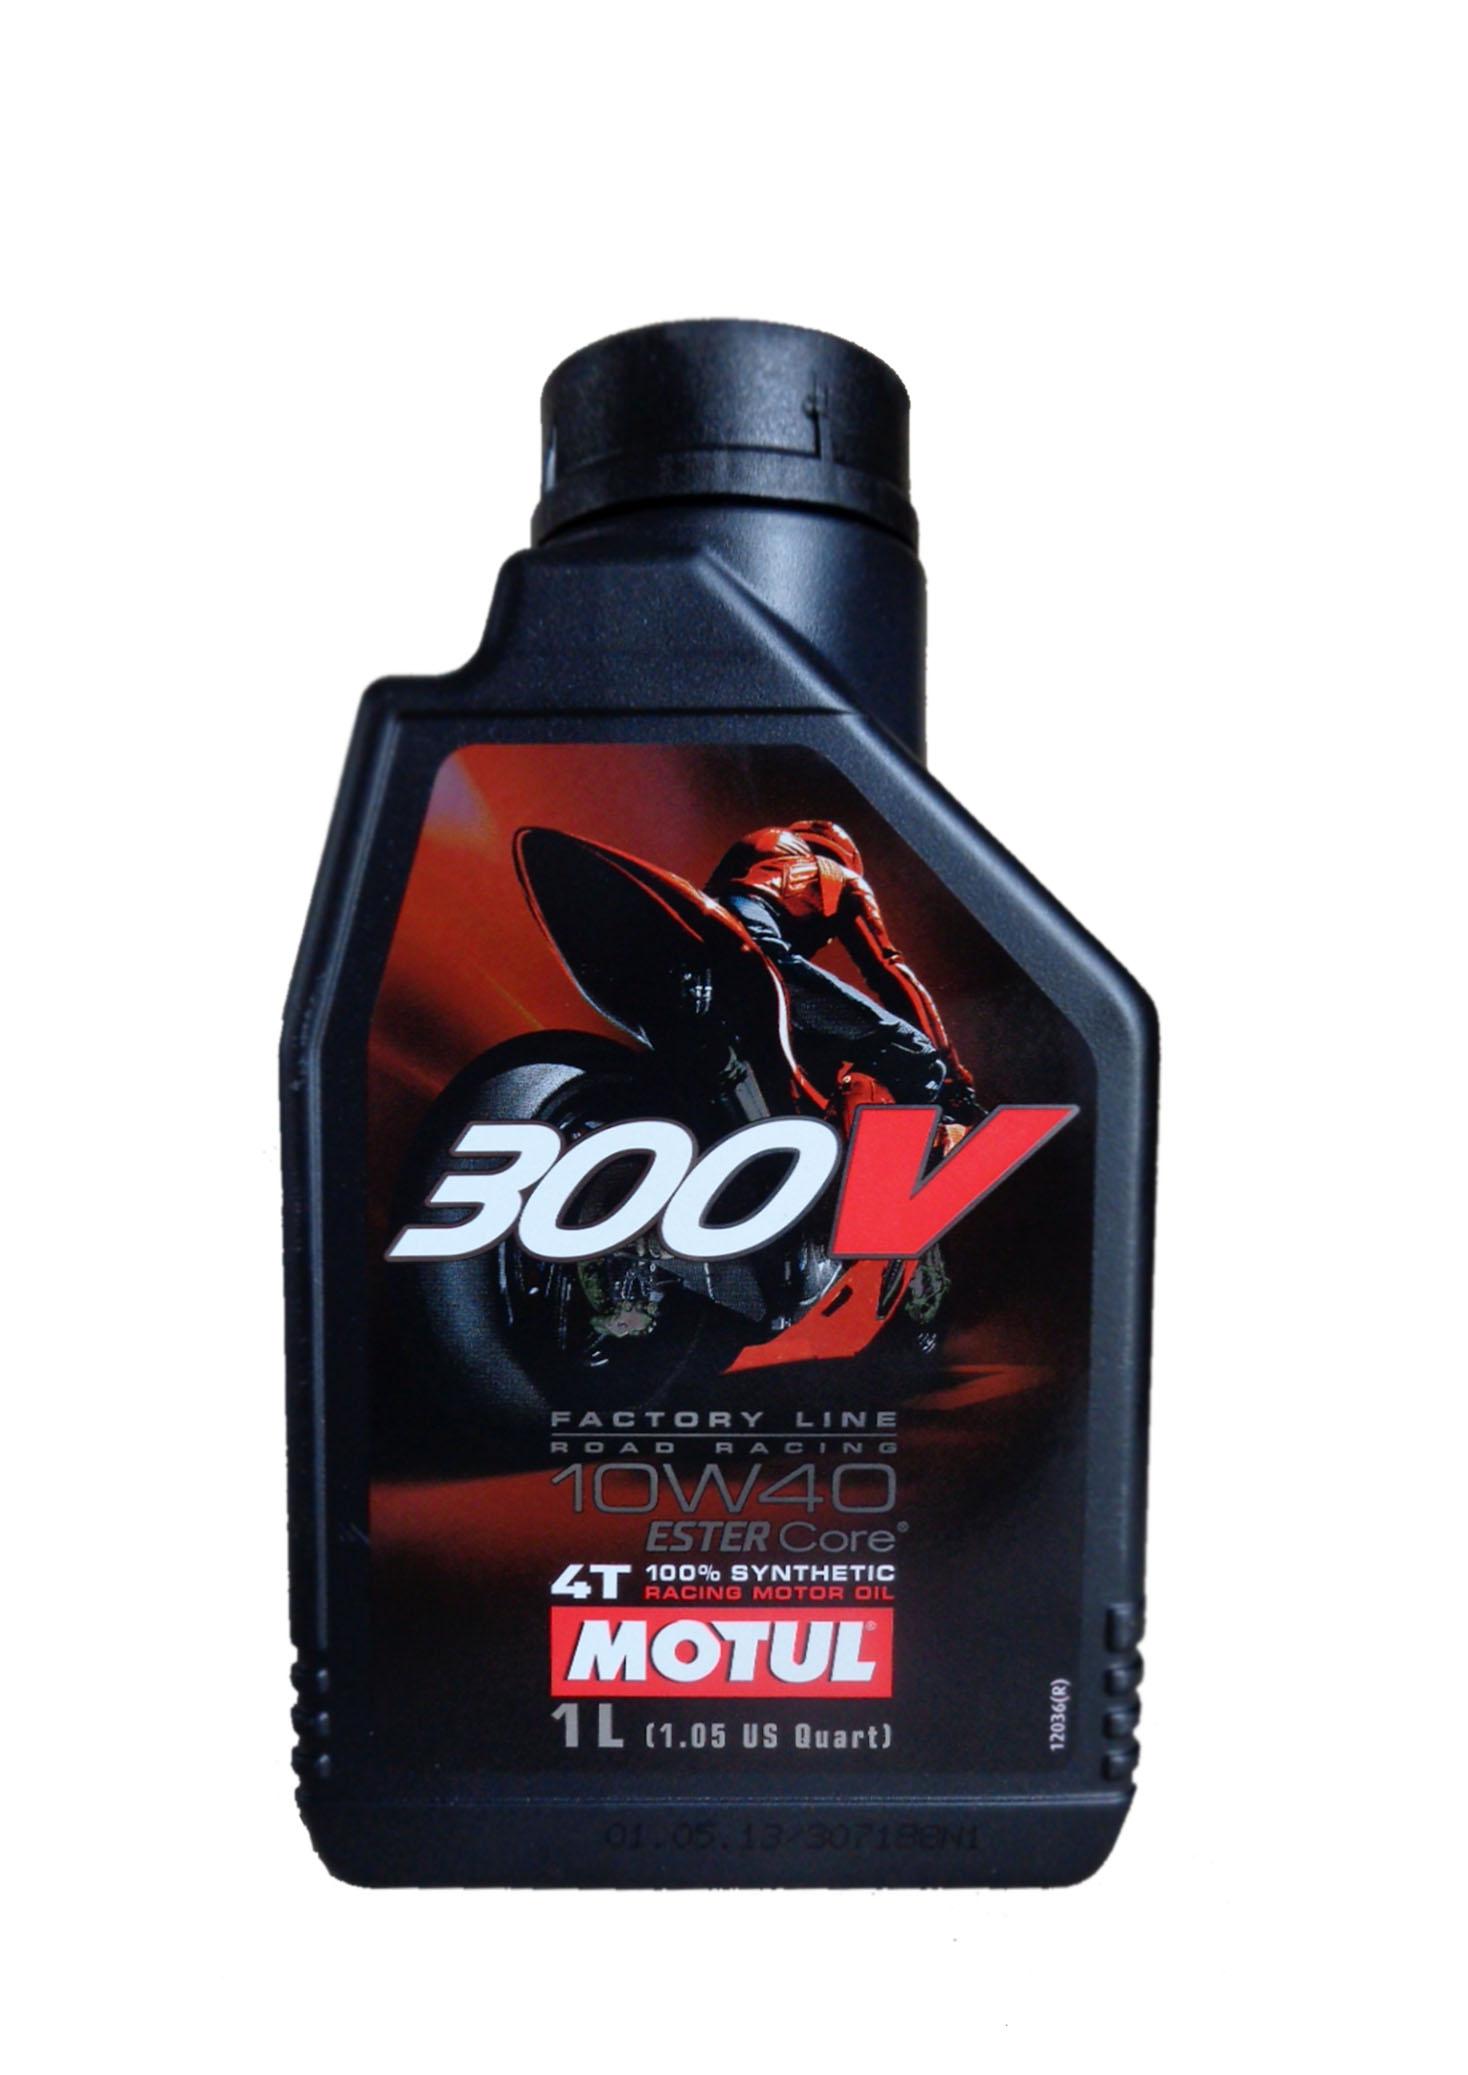 300V 4T Factory Line Road Racing Motul 104118